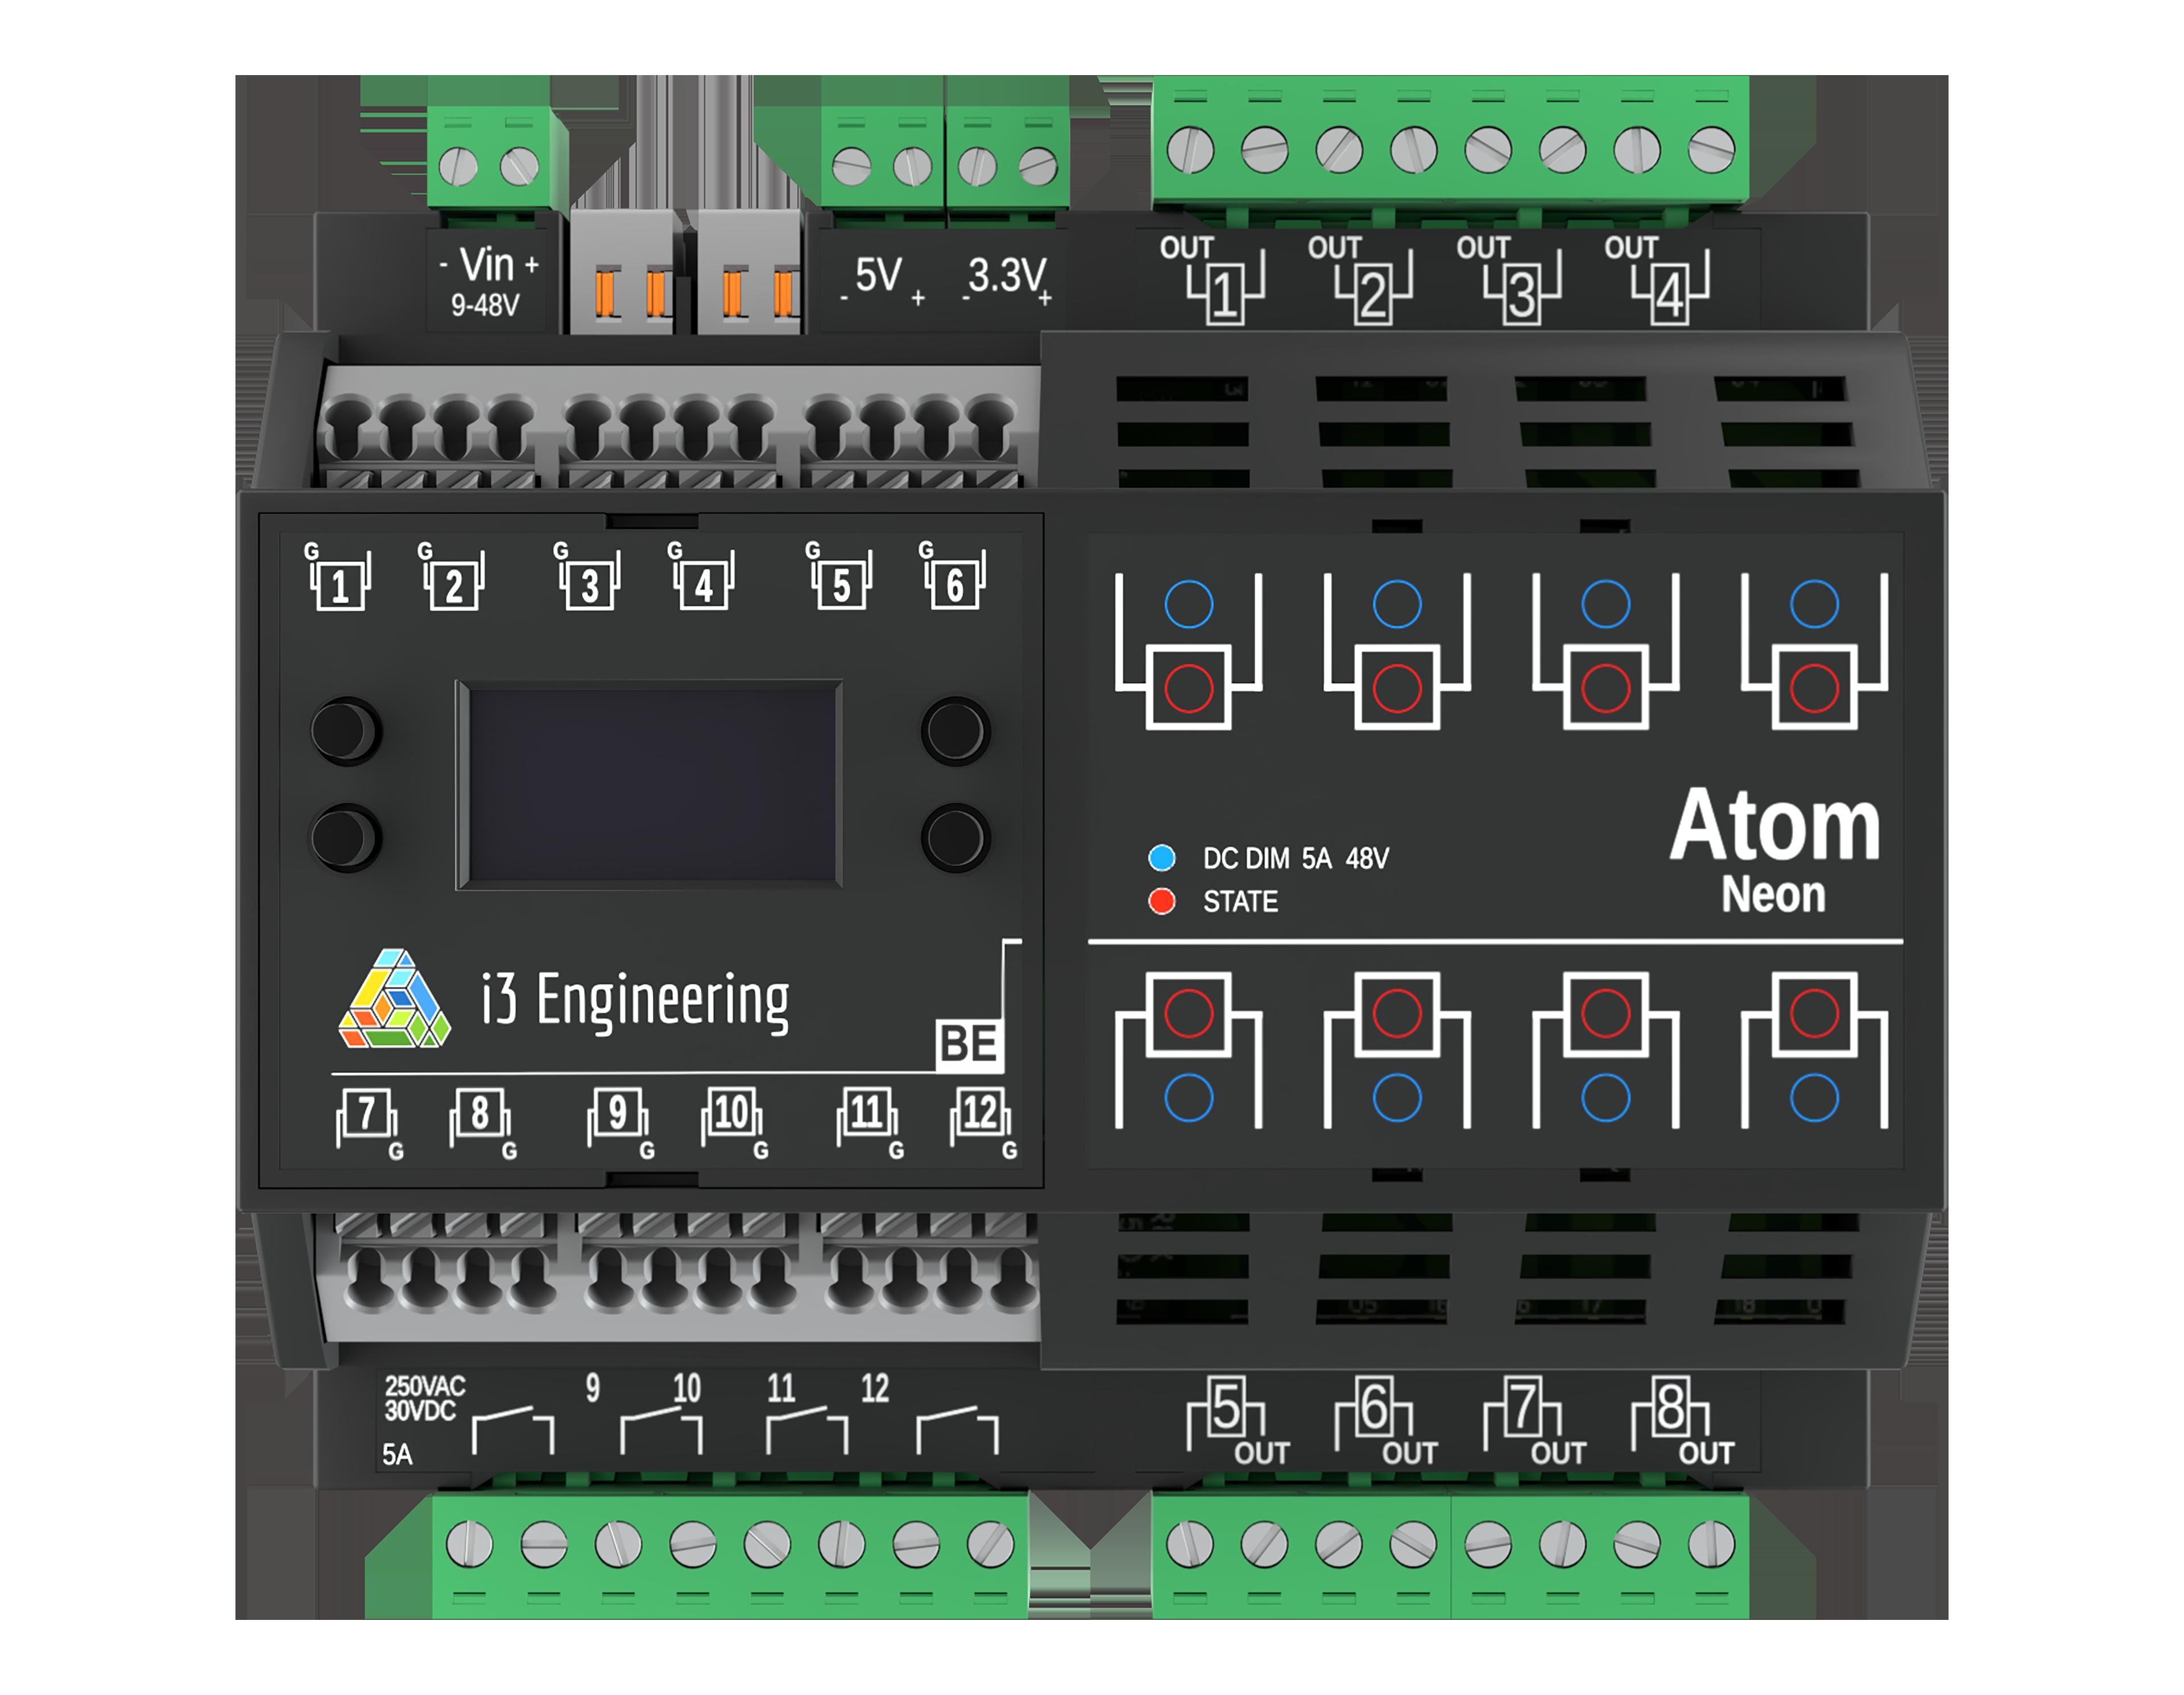 Atom Neon BE